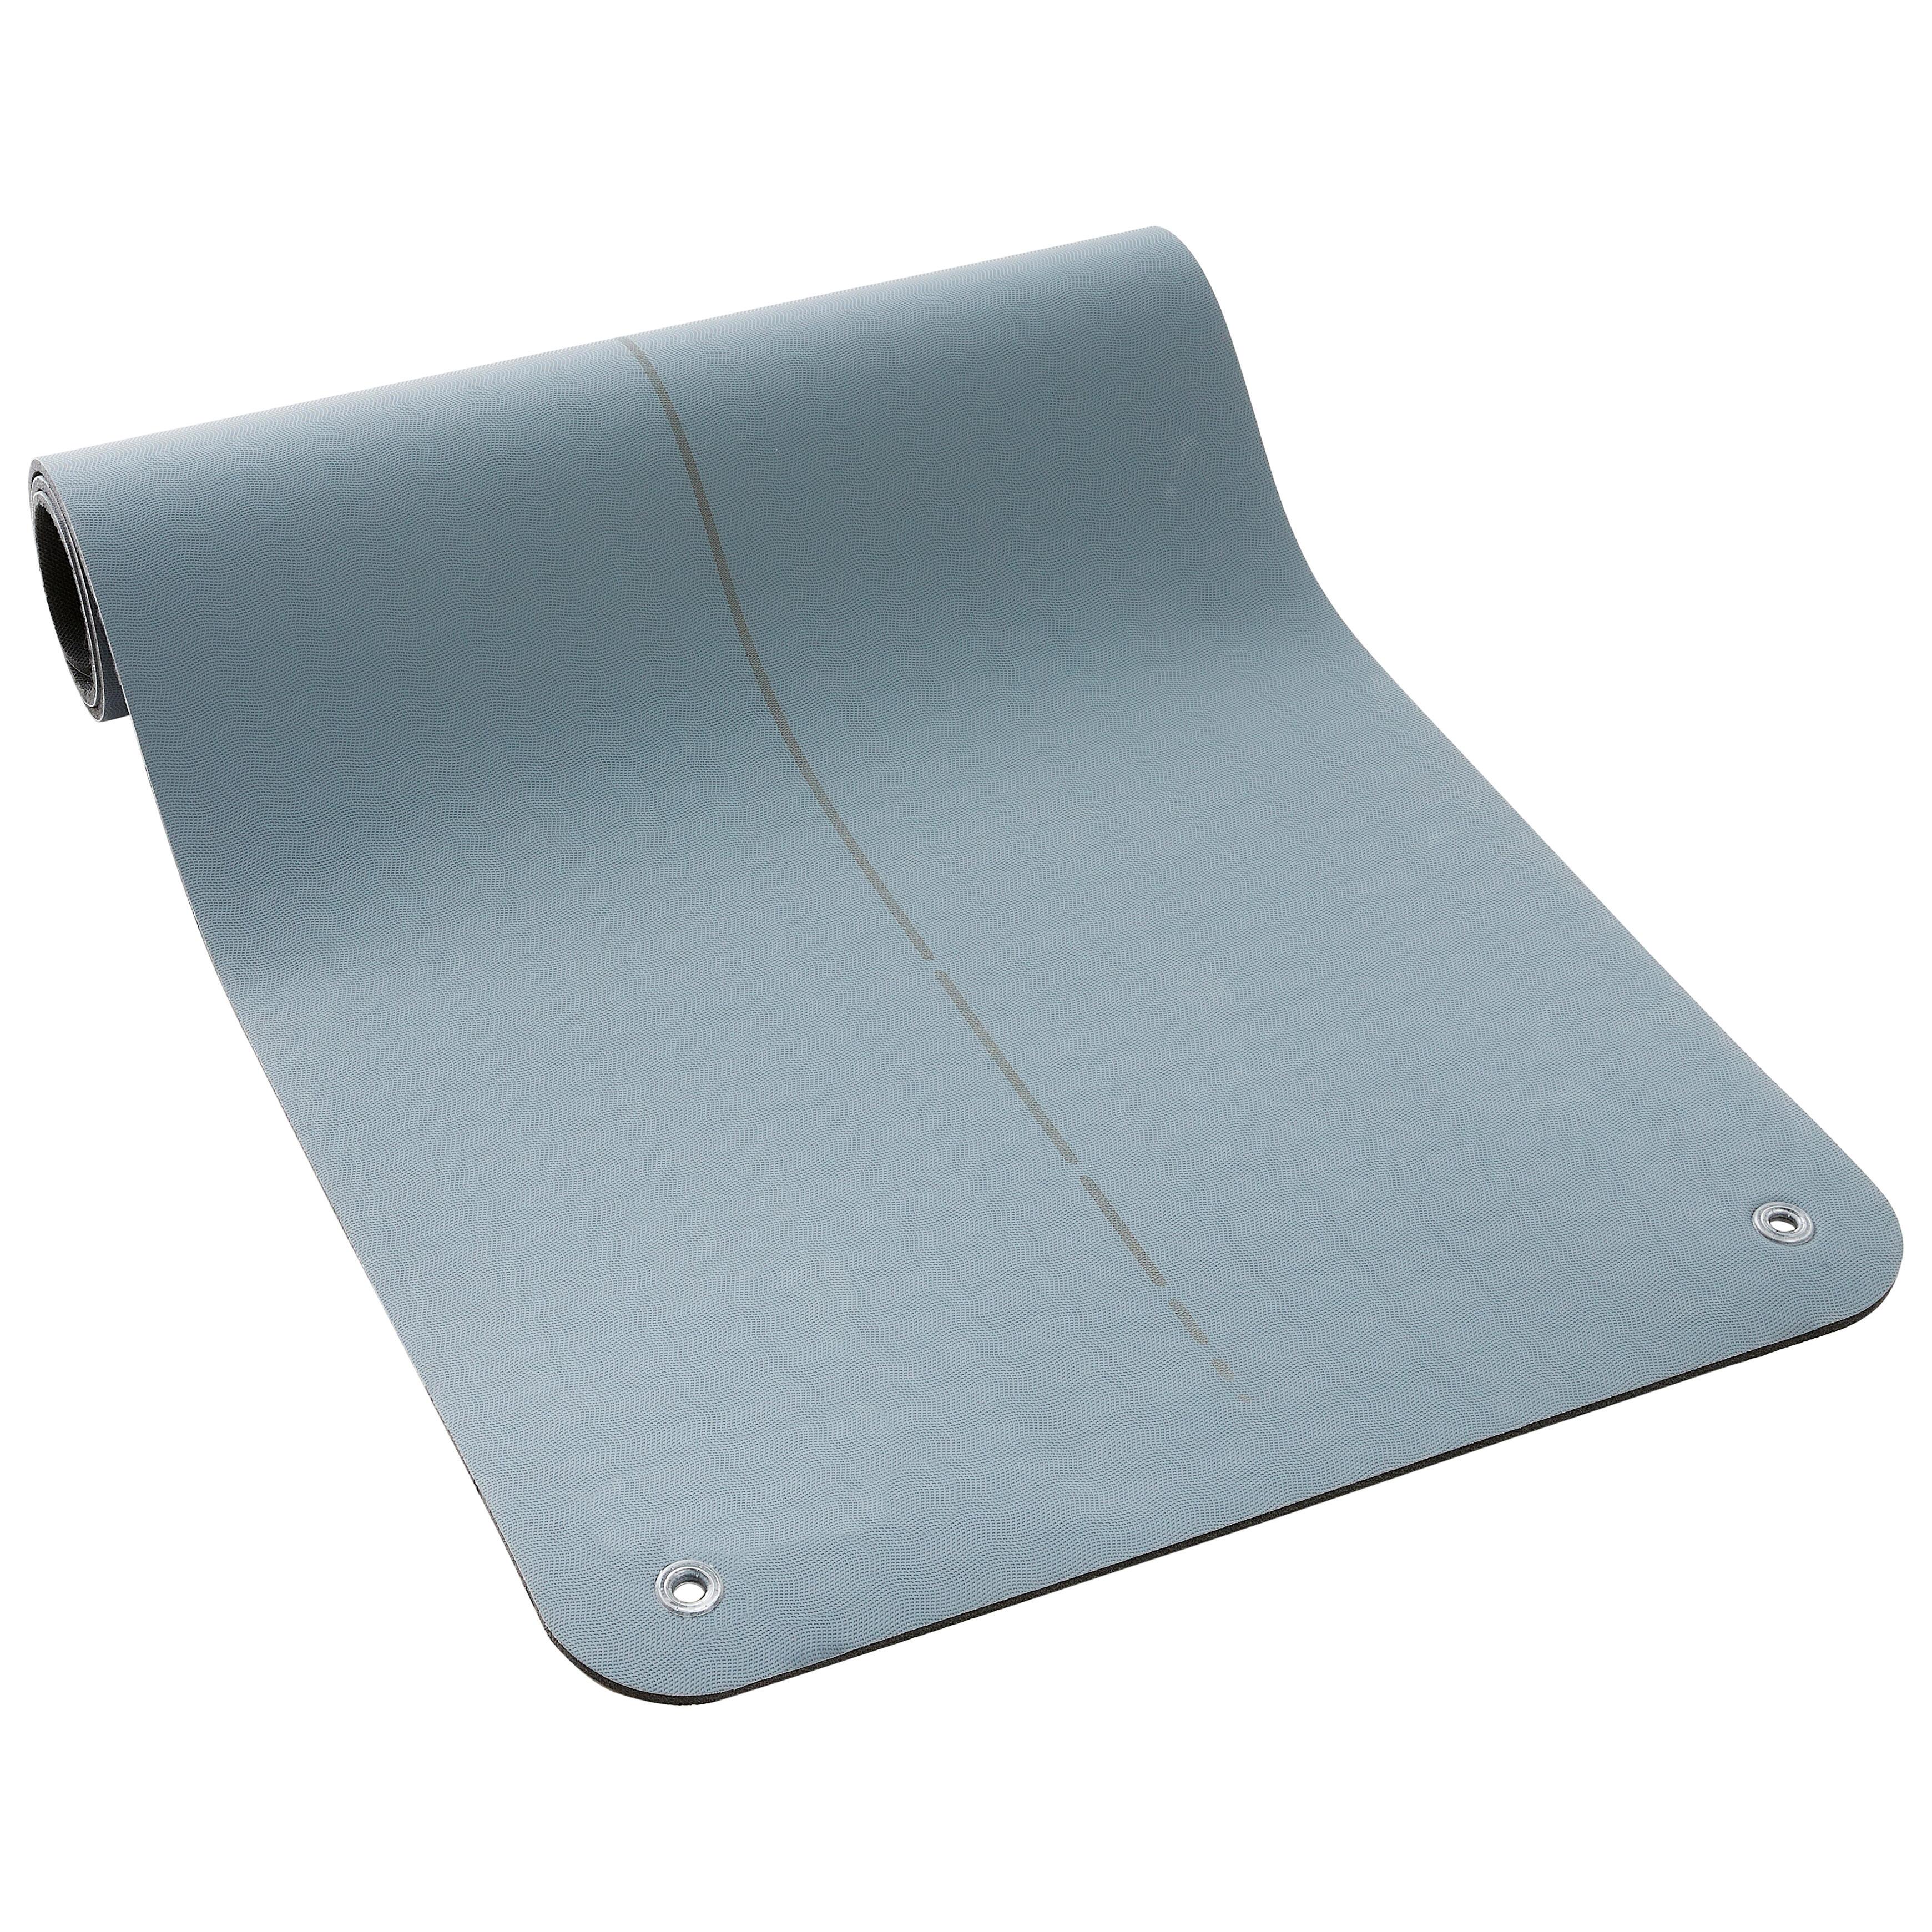 Tapis de sol fitness Tonemat M gris 9cmx9cmX9mm